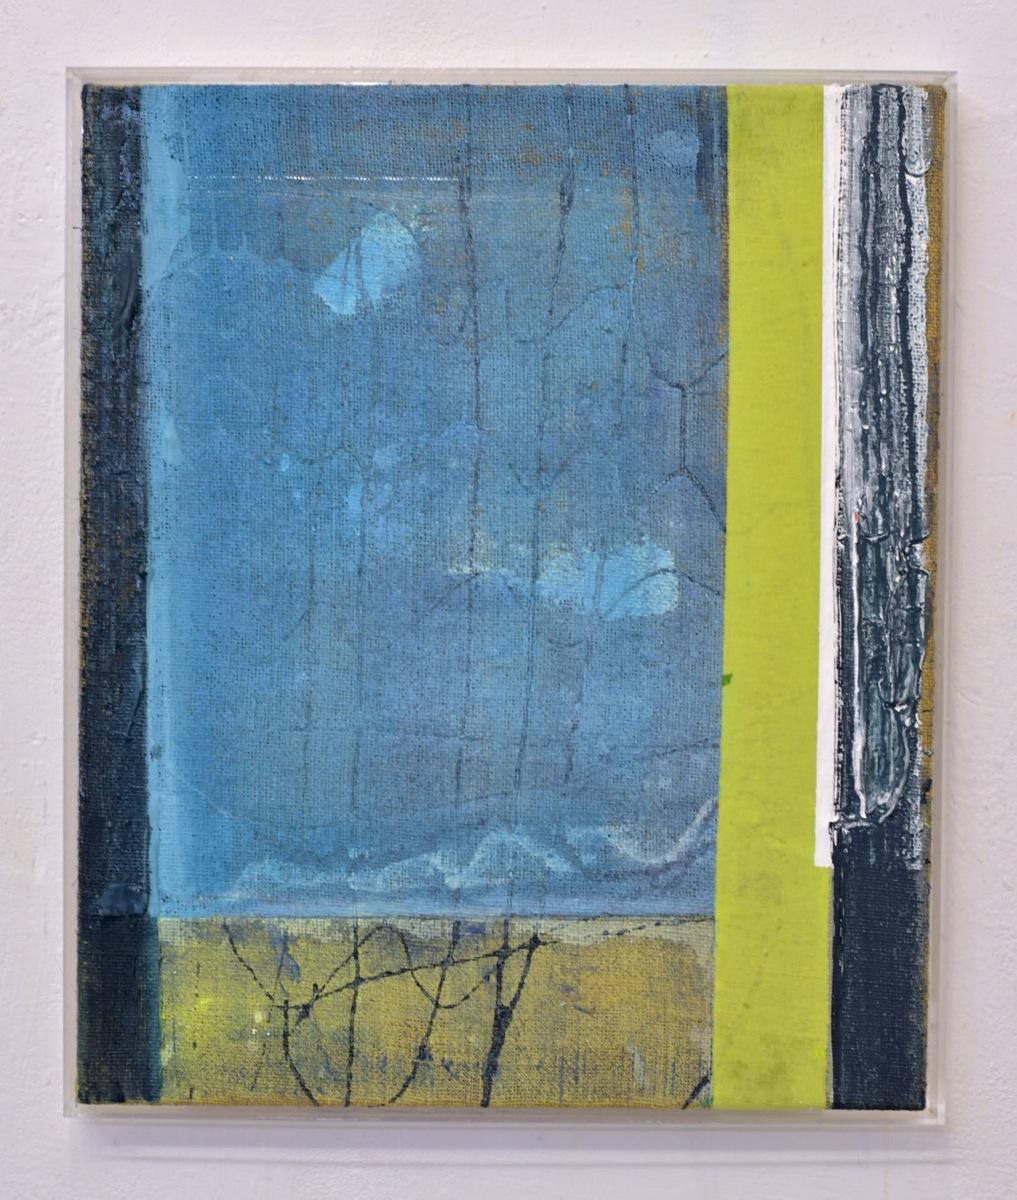 """Fenster"", 62x53 cm, Acrylfarbe, Jute, Plexirahmen, 2015"